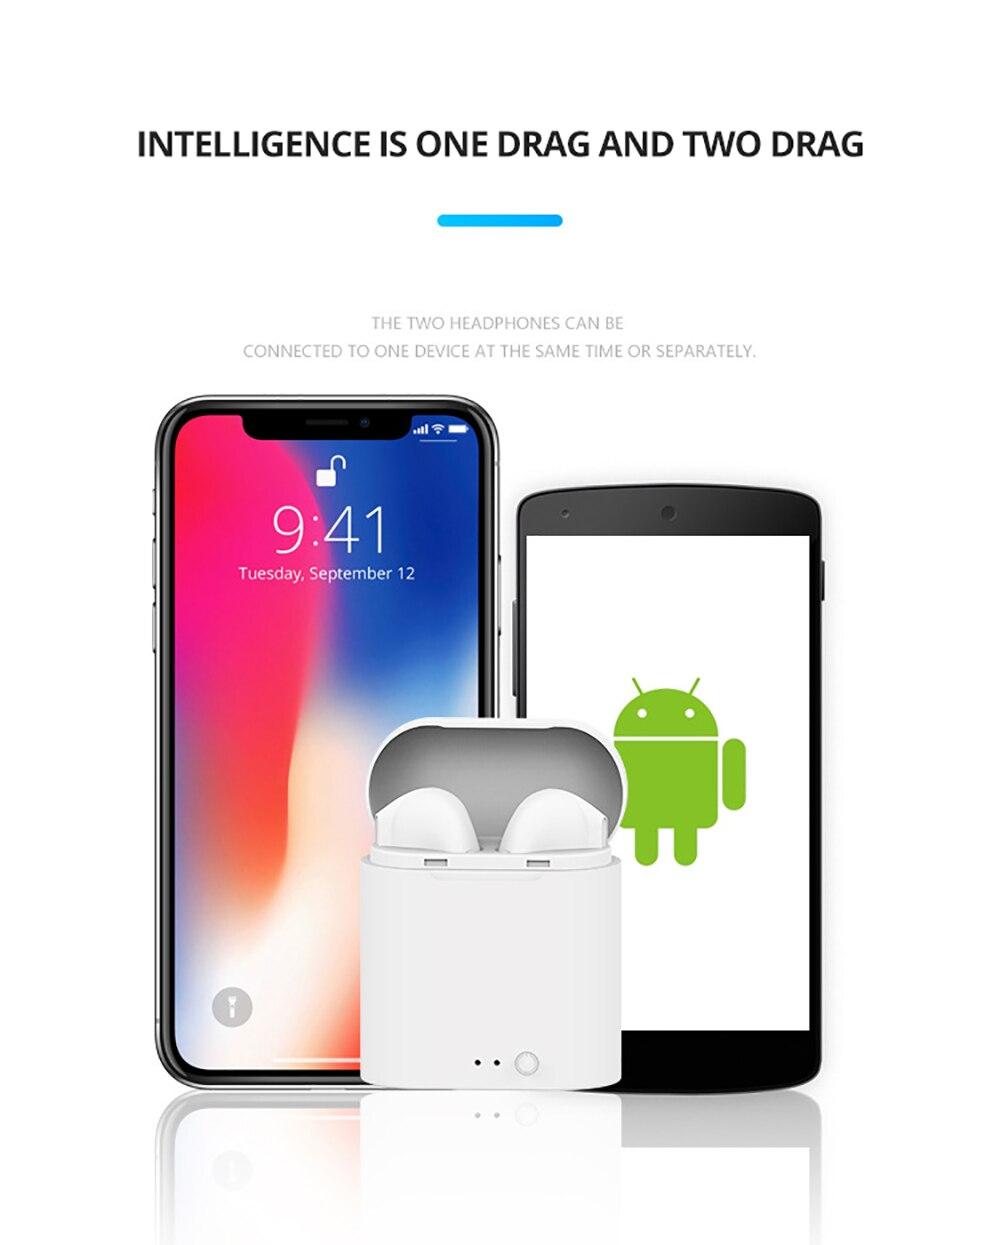 20190118_095623_025